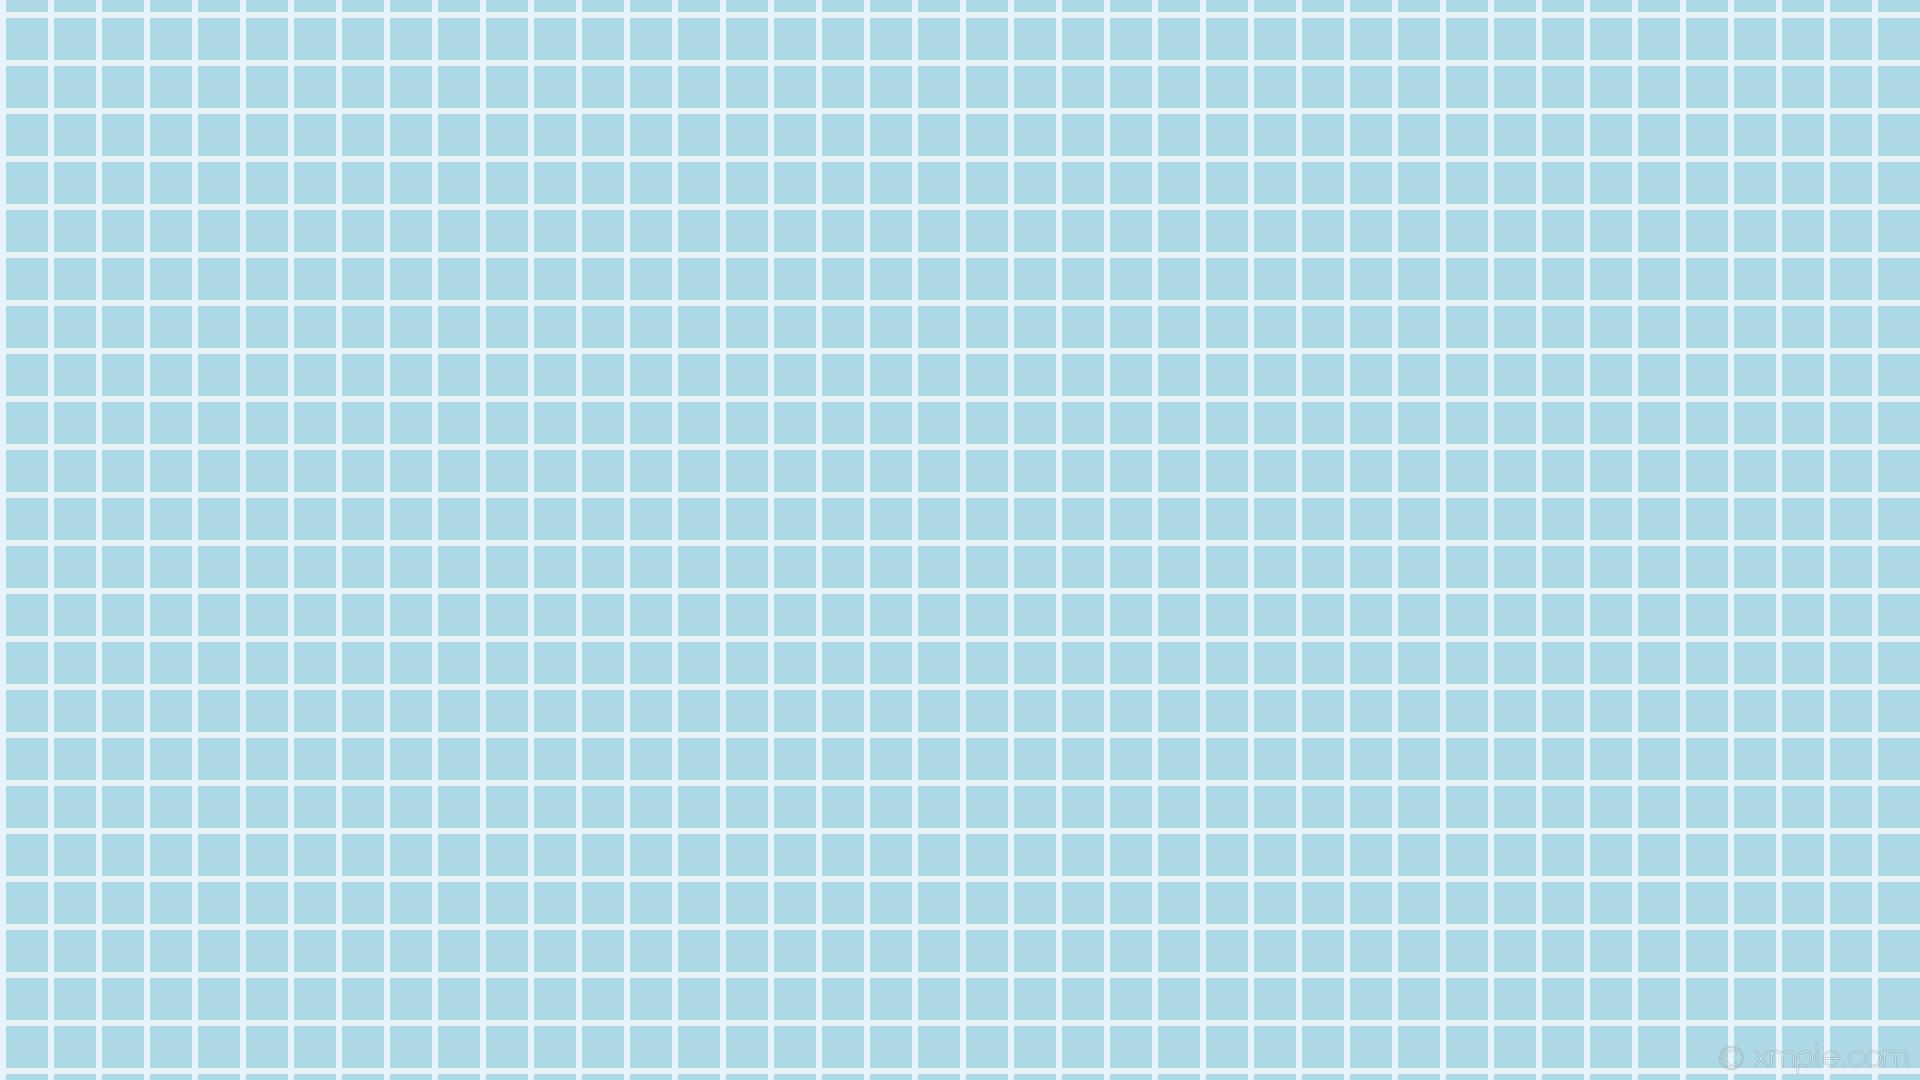 Blue Aesthetic Background 1920x1080 Largest Wallpaper Portal Lockscreen blue pastel aesthetic dinding gambar foto wisata. blue aesthetic background 1920x1080